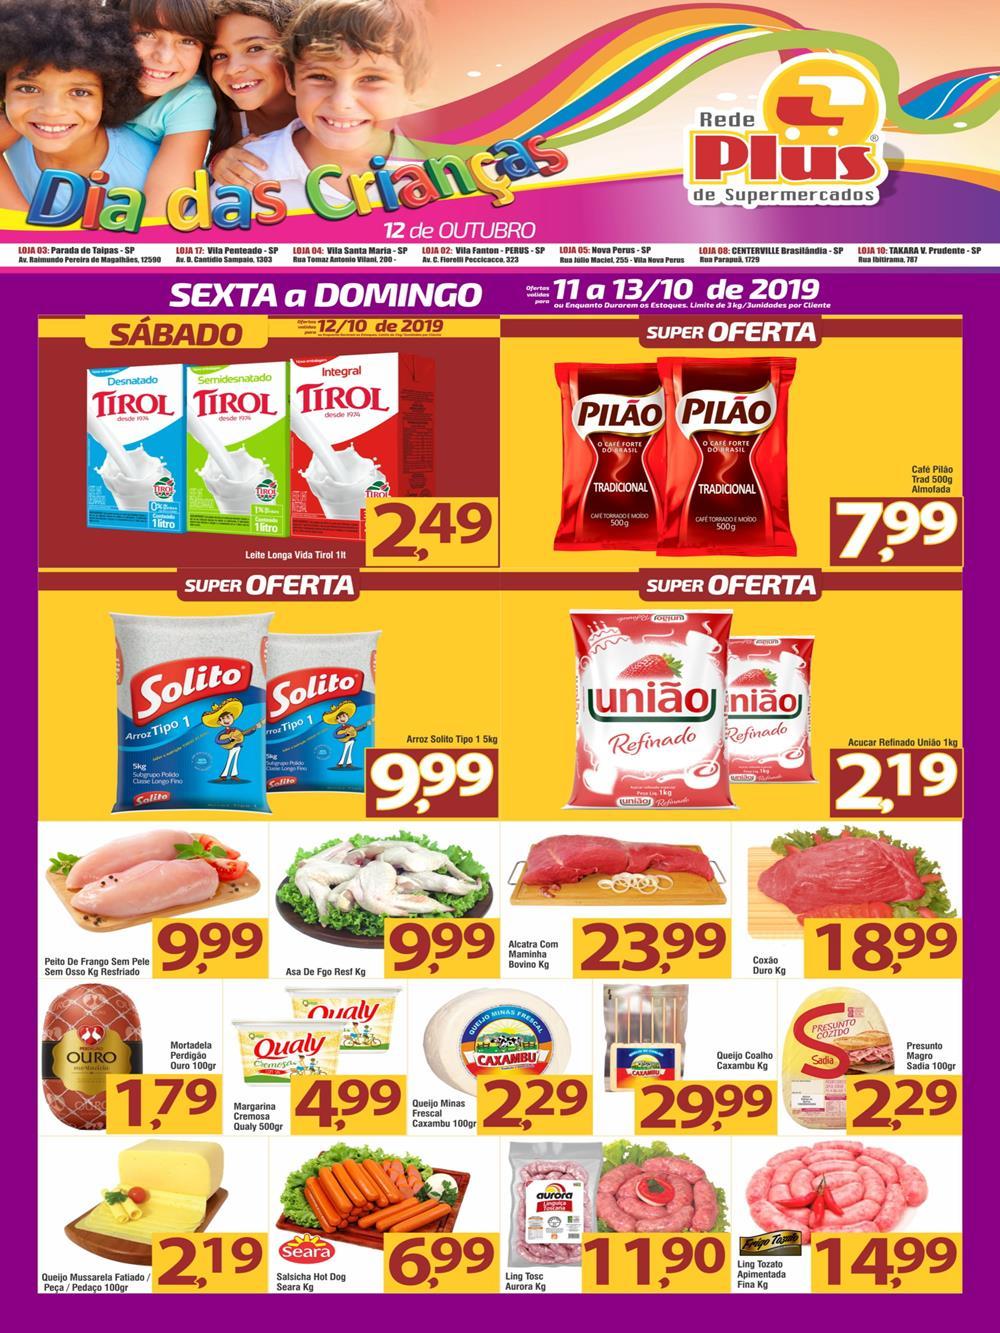 redeplus-Ofertas-Tabloide1 Ofertas de supermercados - Black Friday 2019